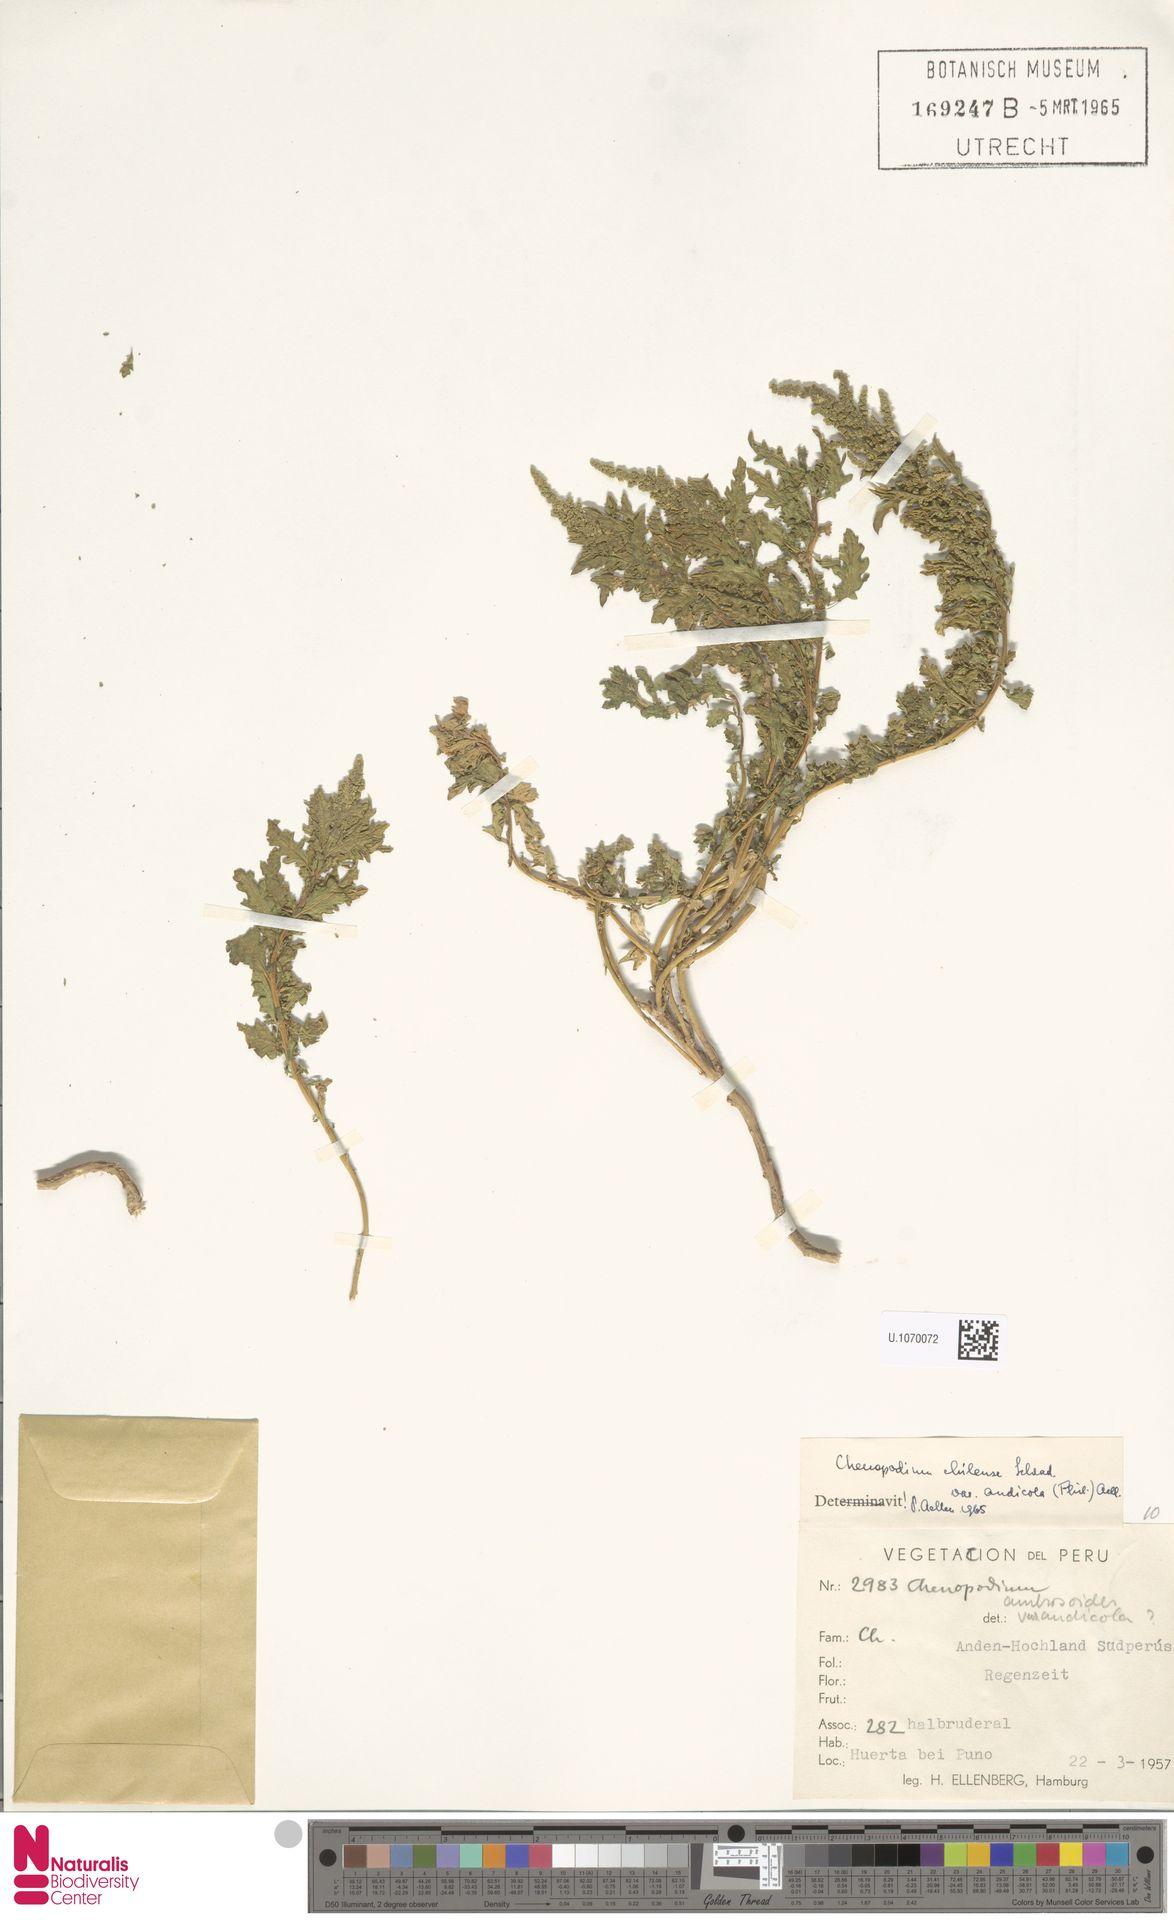 U.1070072 | Chenopodium chilense Pers.